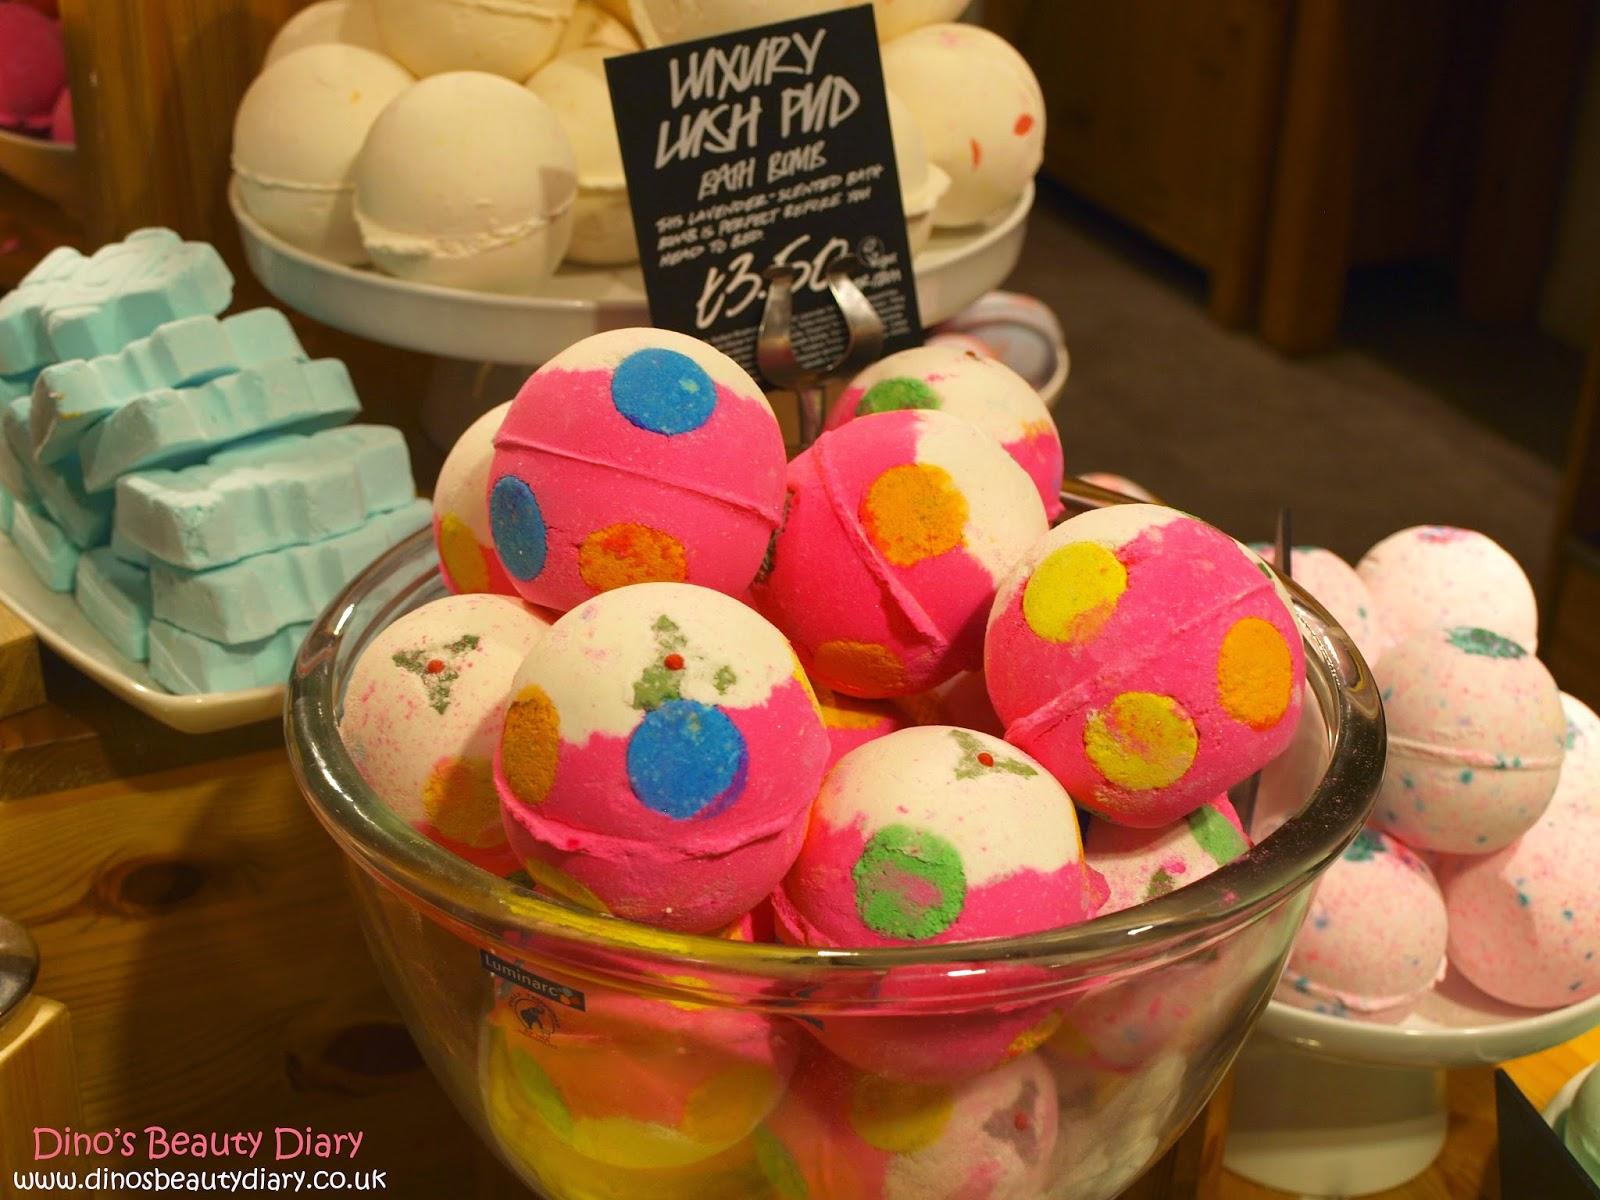 Dino's Beauty Diary - Lush Nottingham Bloggers Event - luxury lush pids bath bombs